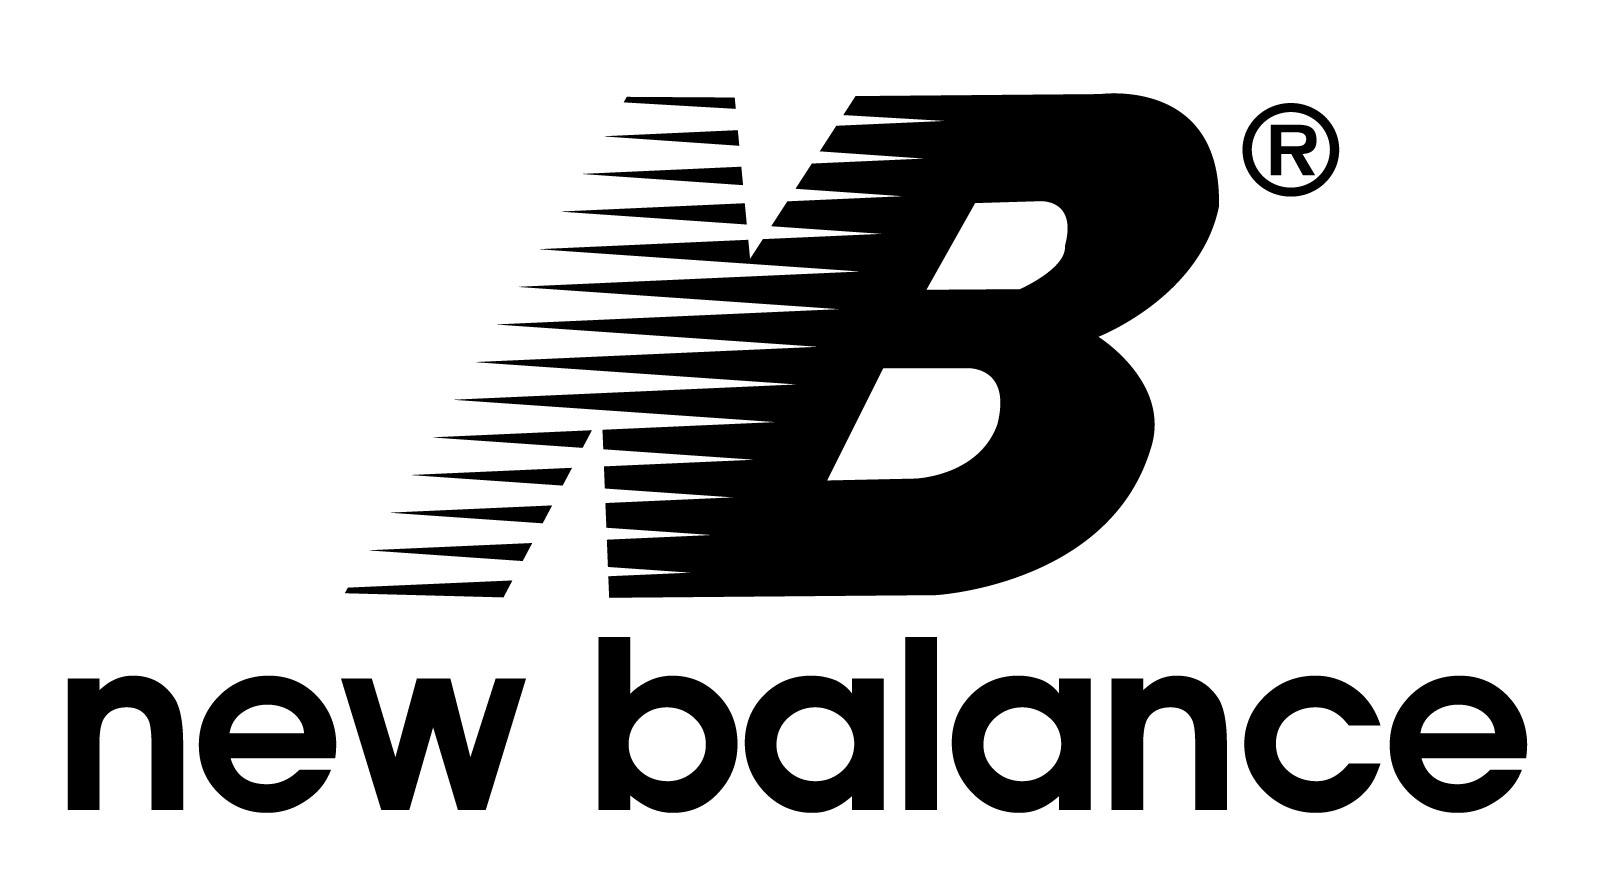 New-Balance-Logo.jpg - New Balance Logo PNG